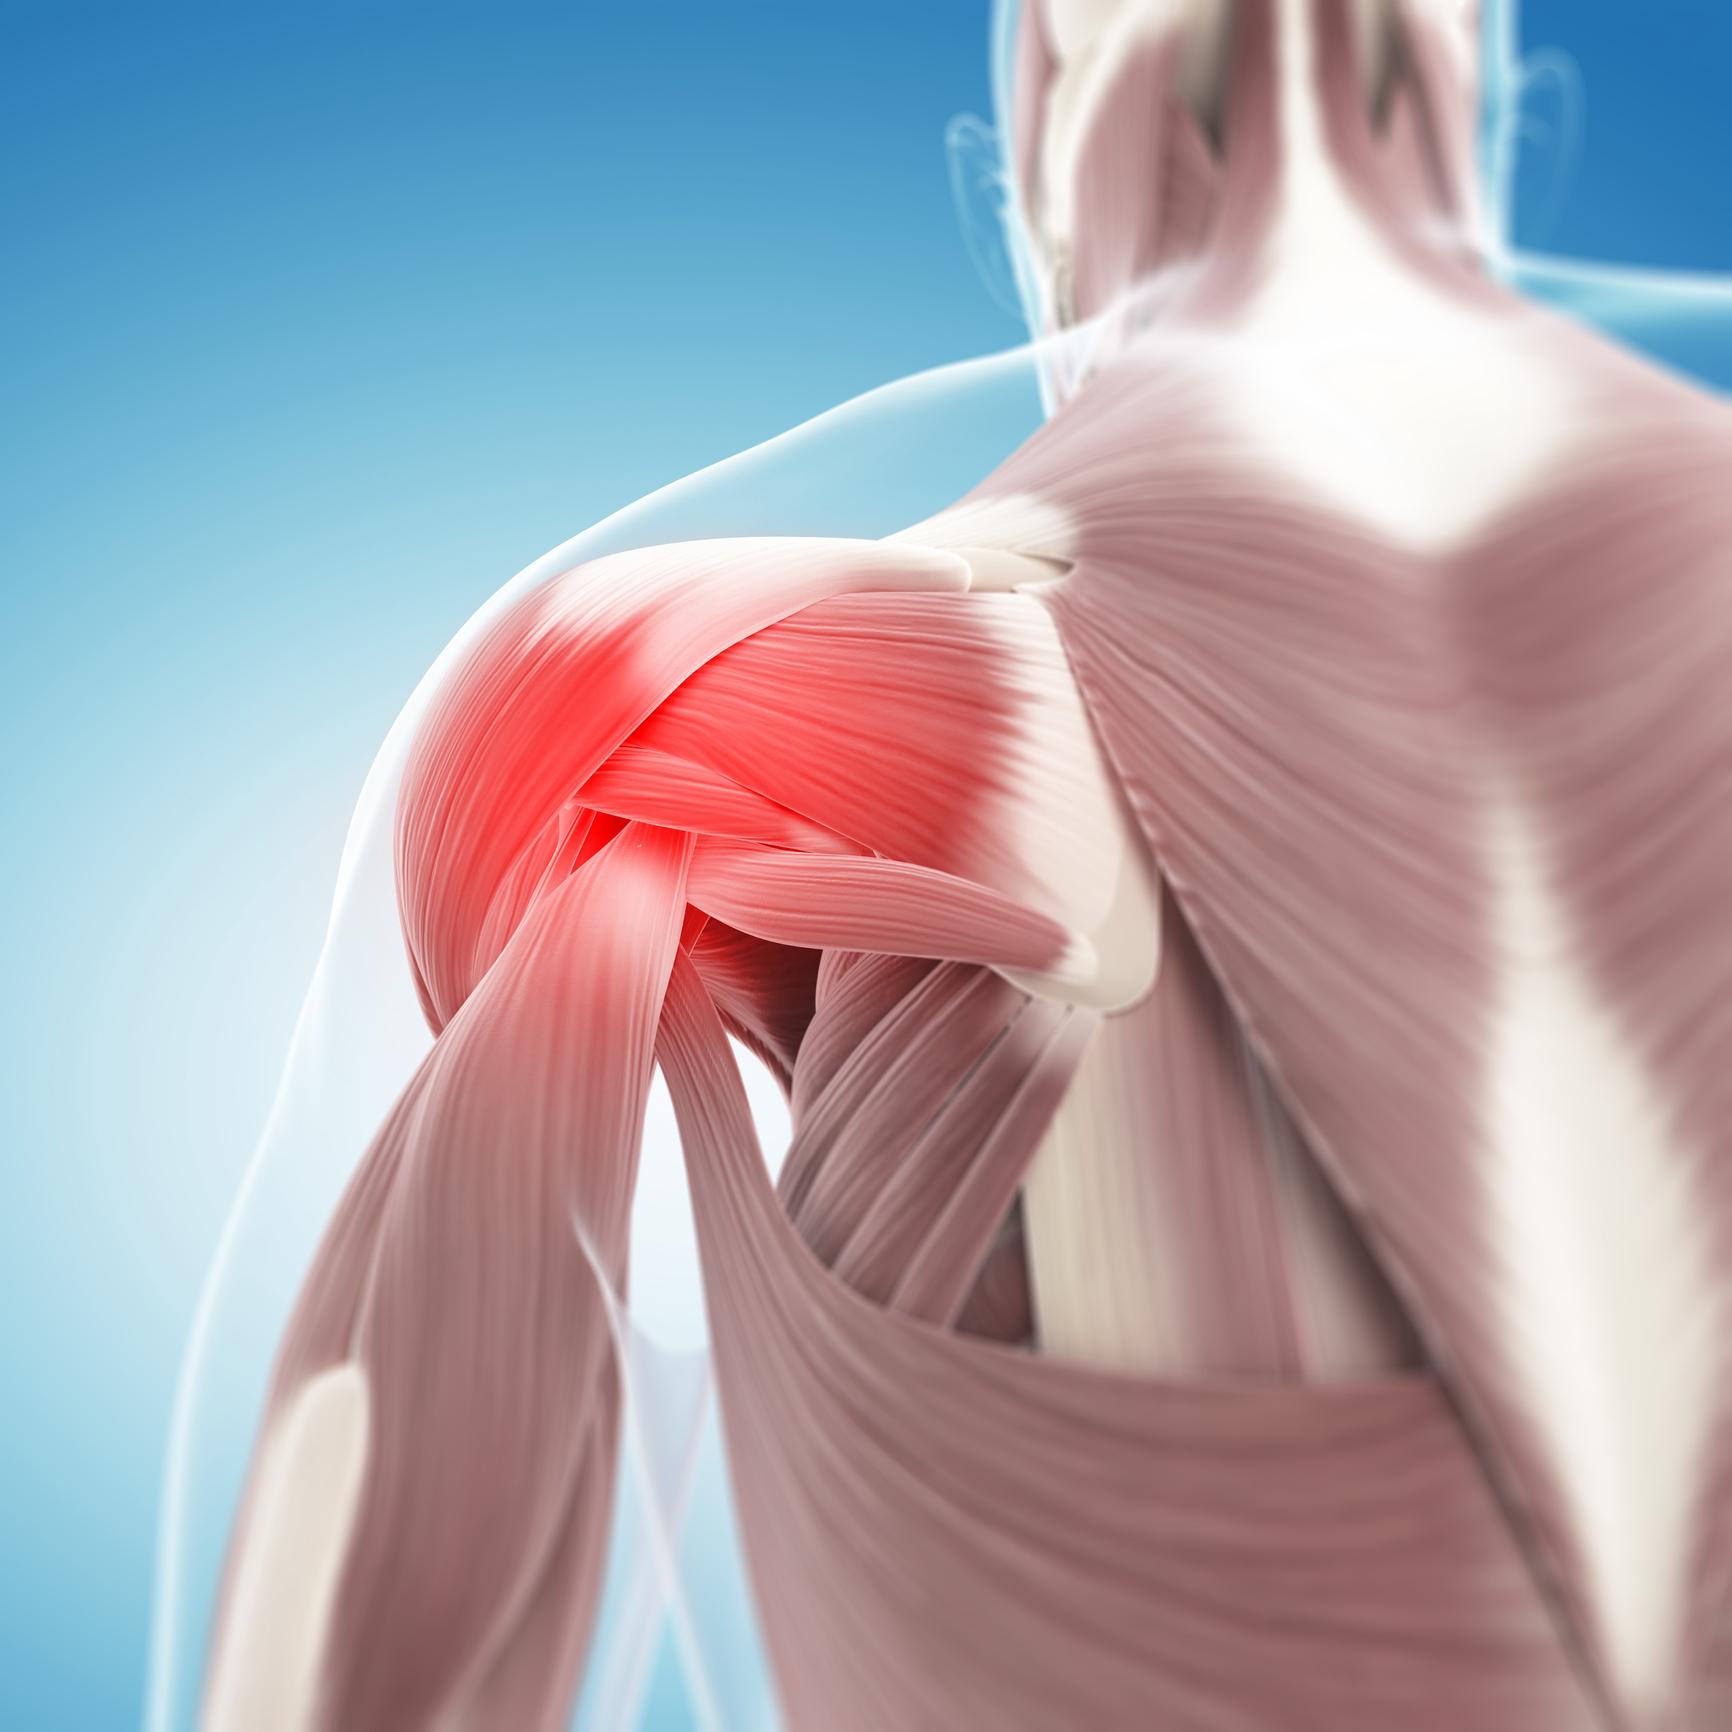 hight resolution of rotator cuff tear anatomy shoulder